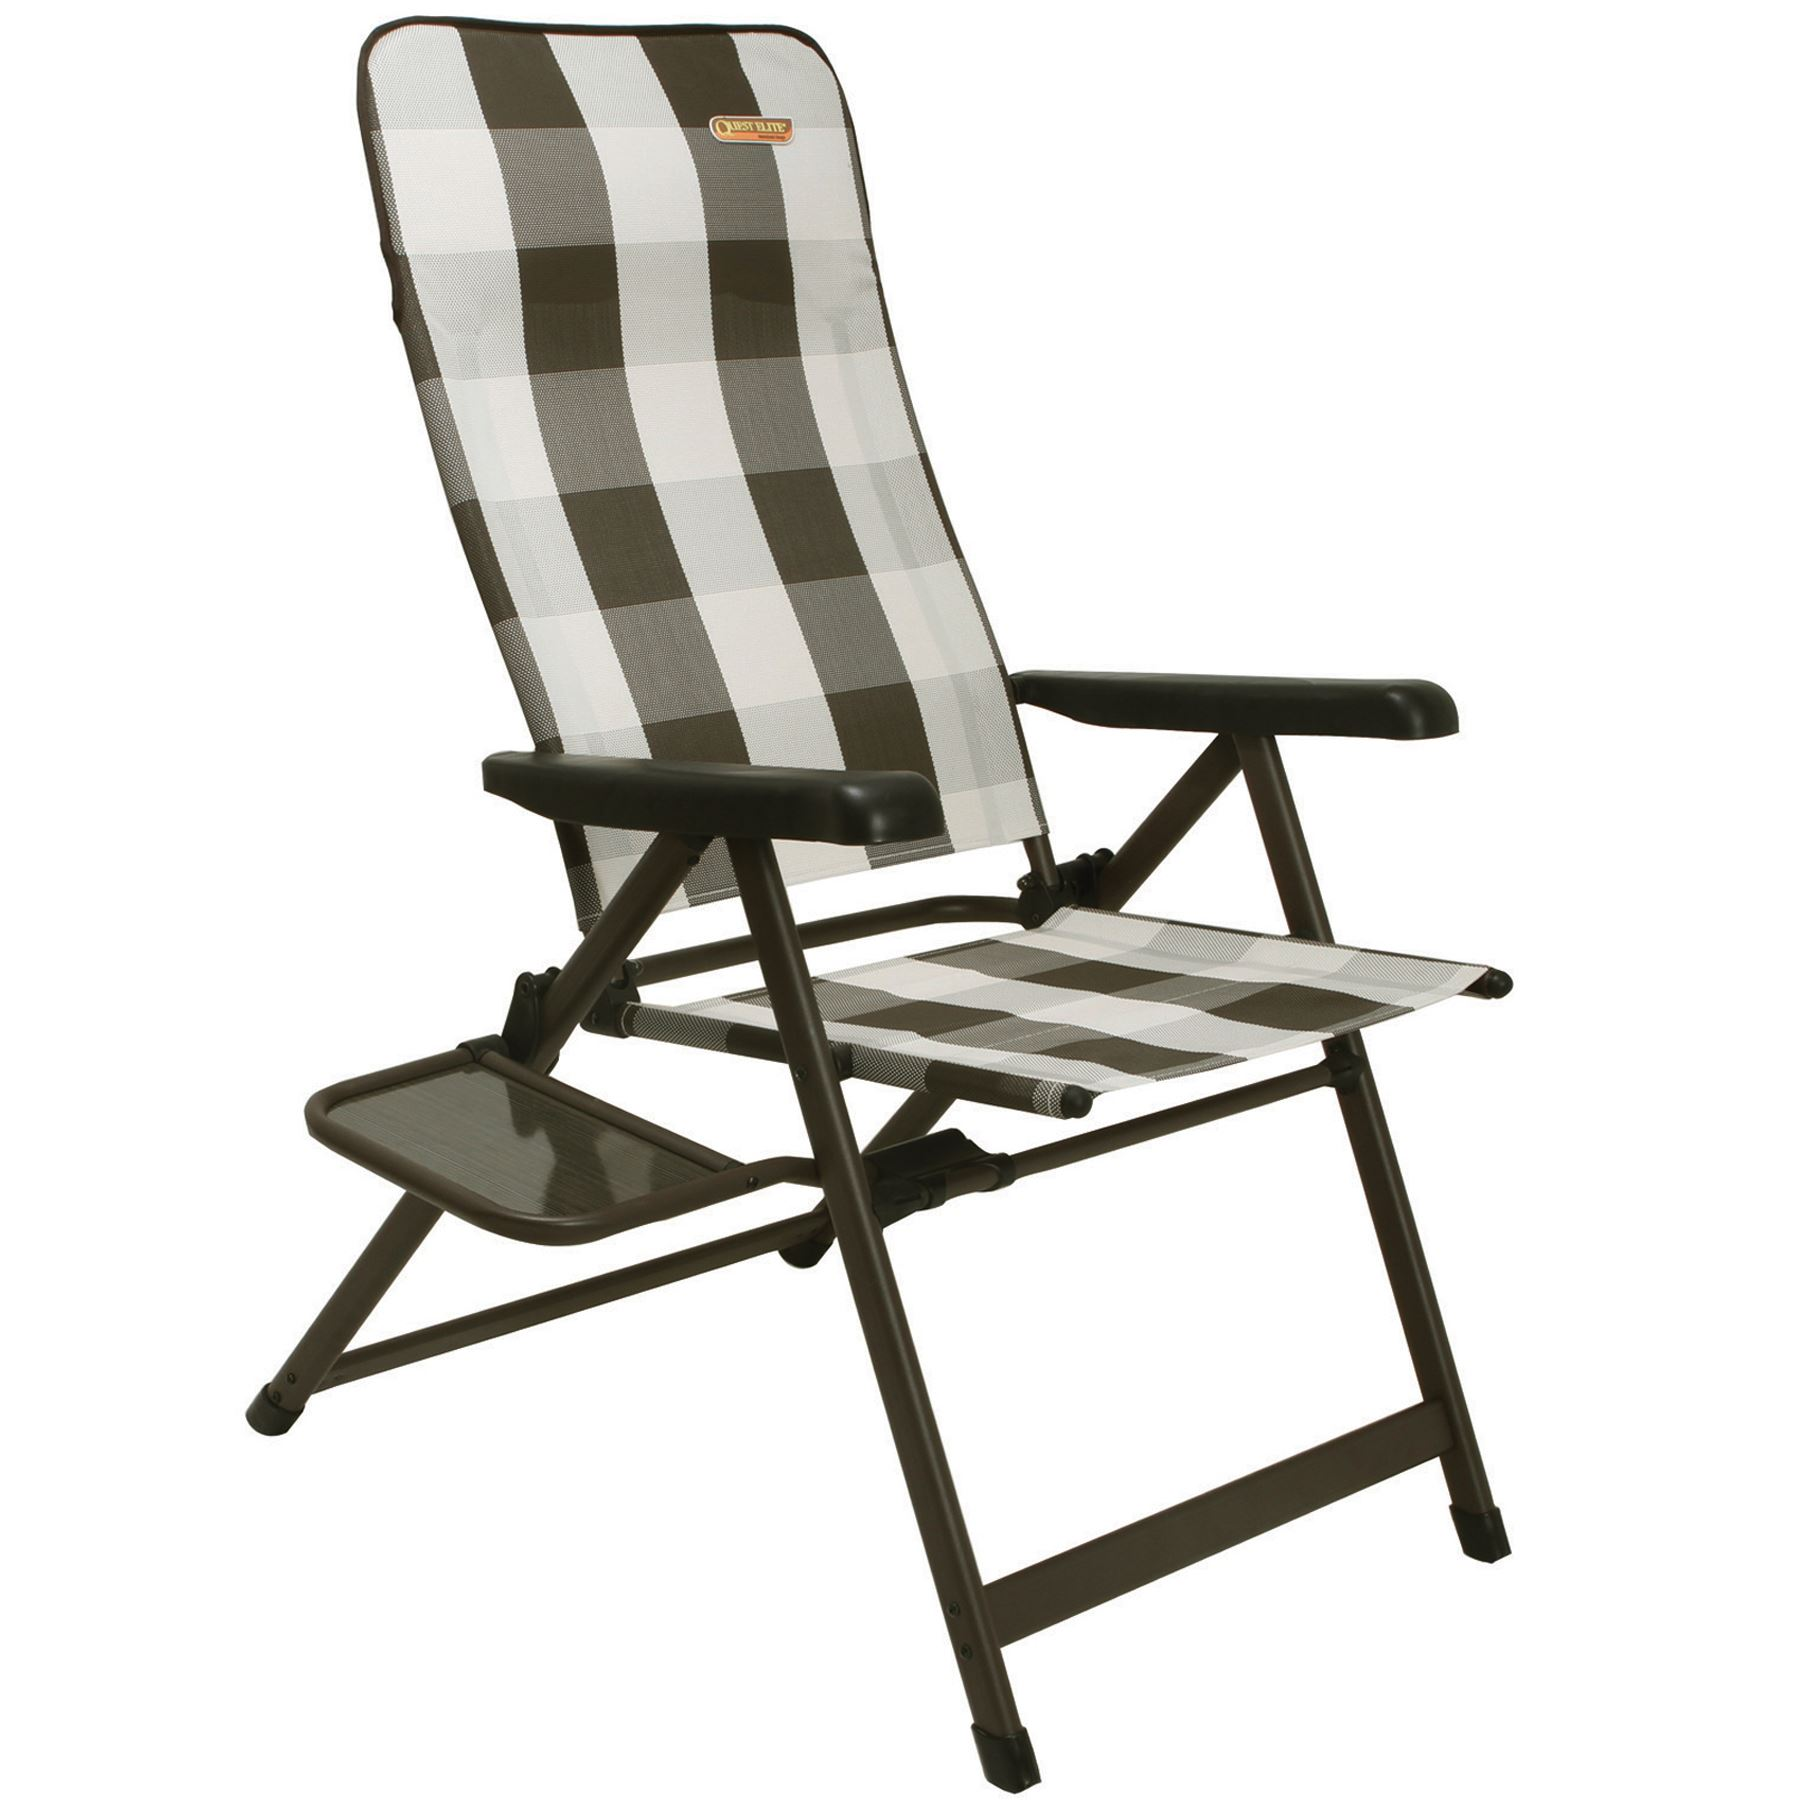 Quest Marrakesh Premium XL Chair Side Table Recliner Aluminium